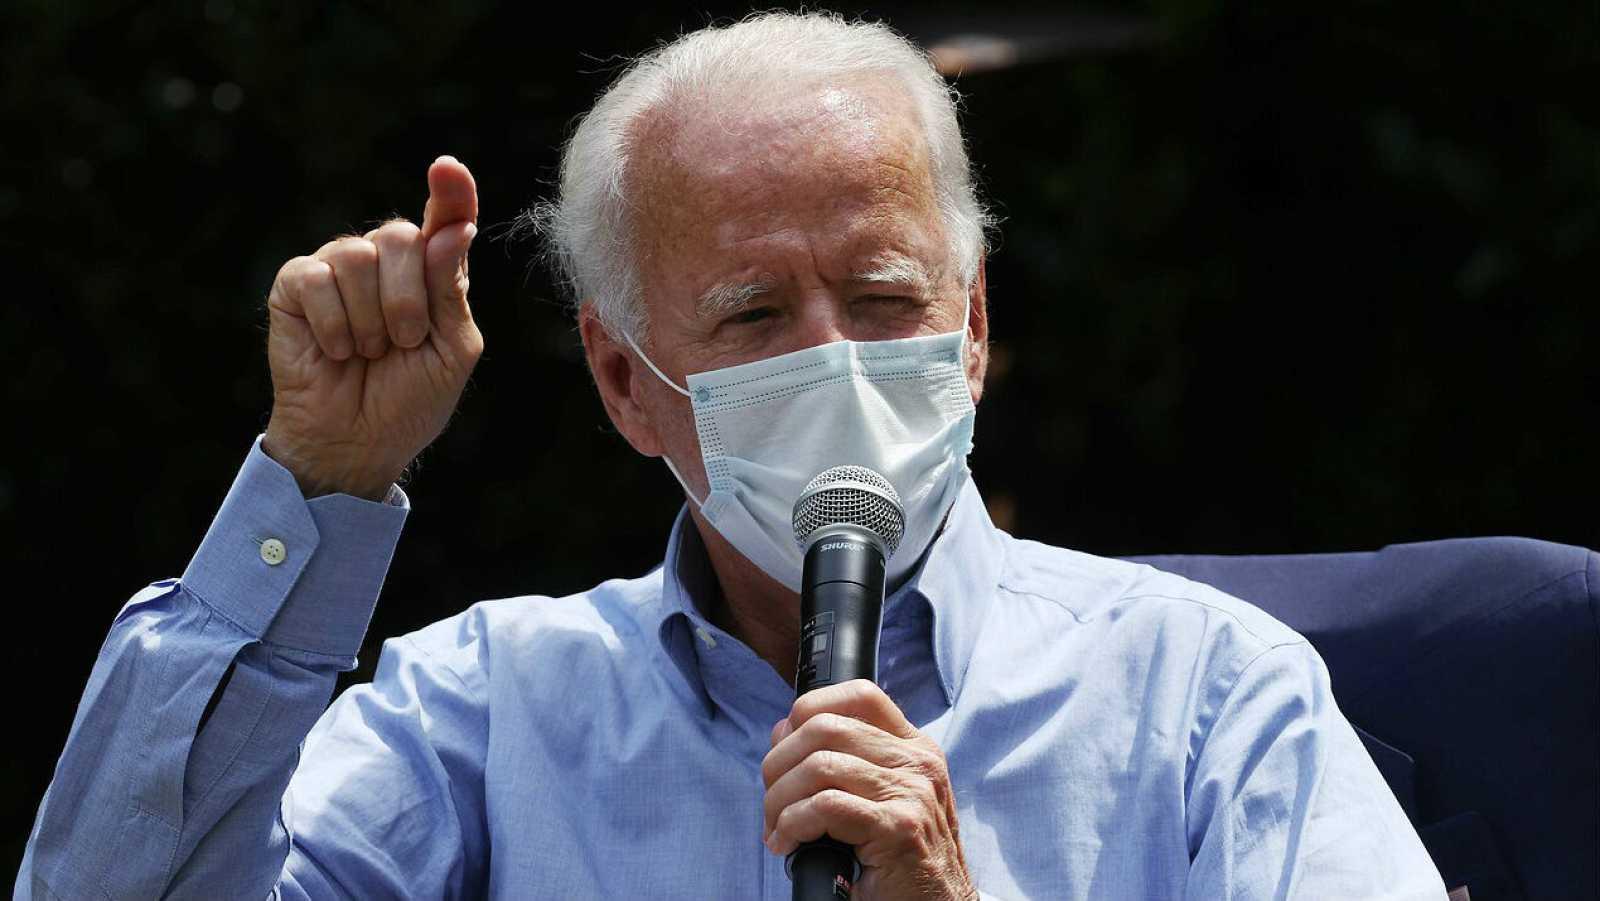 El candidato presidencial demócrata, Joe Biden, durante un acto de campaña en Lancaster, Pennsylvania.